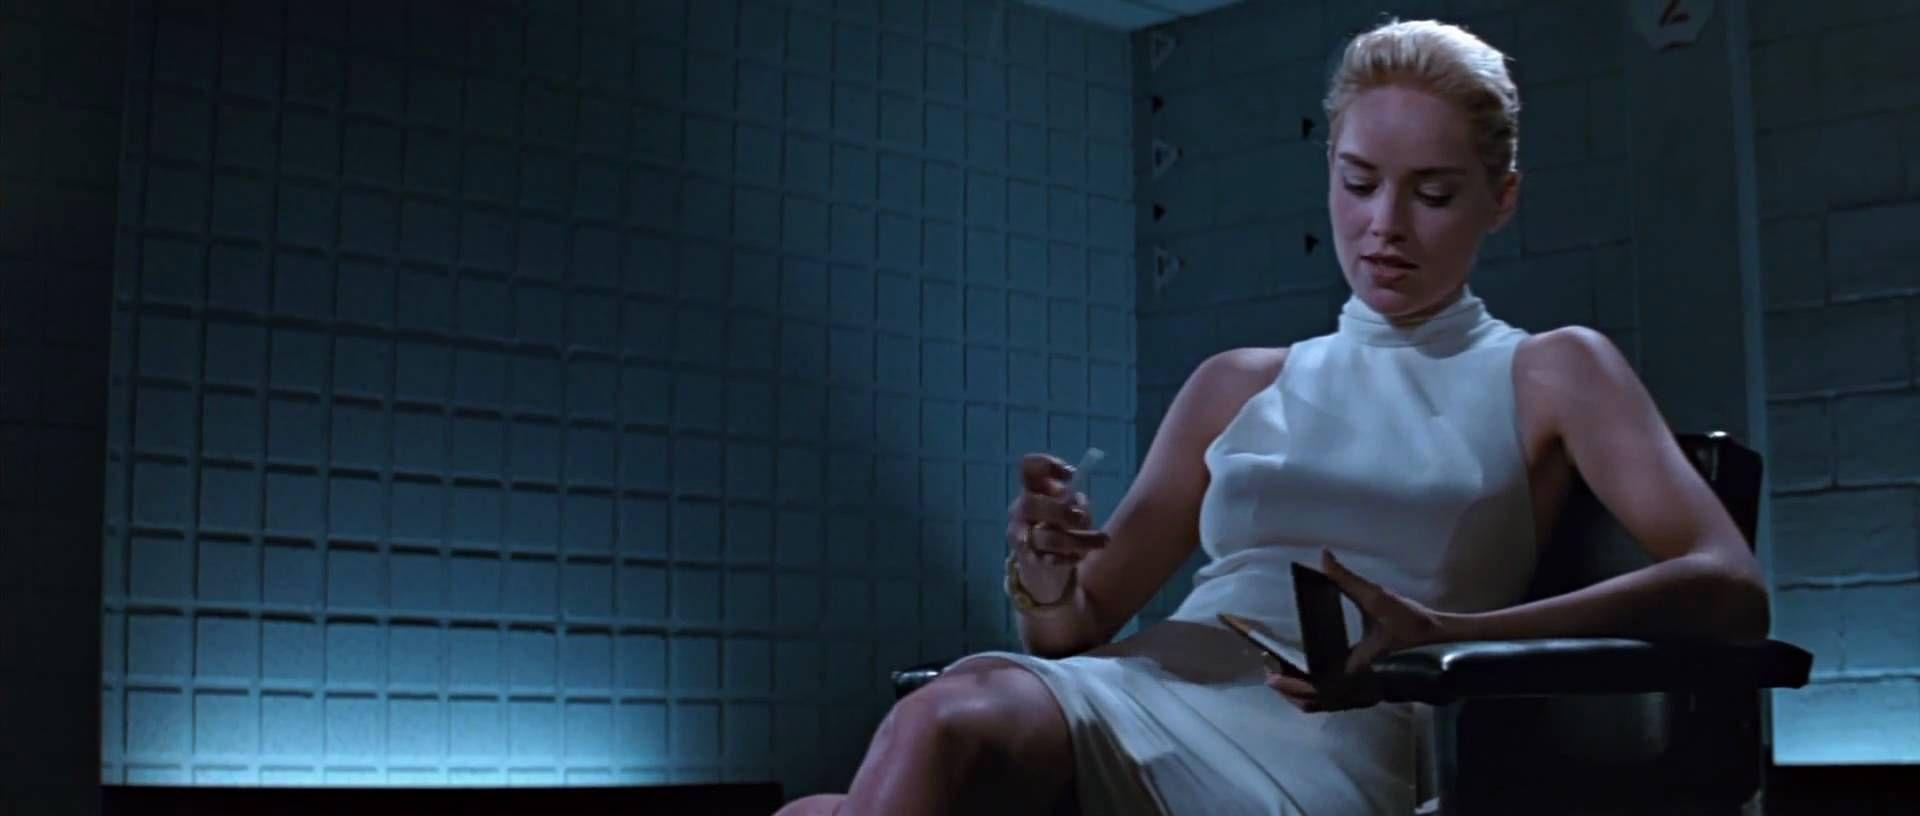 Animal Instincts 1992 Movie basic instinct - detective interview scene 1080p hd | sharon